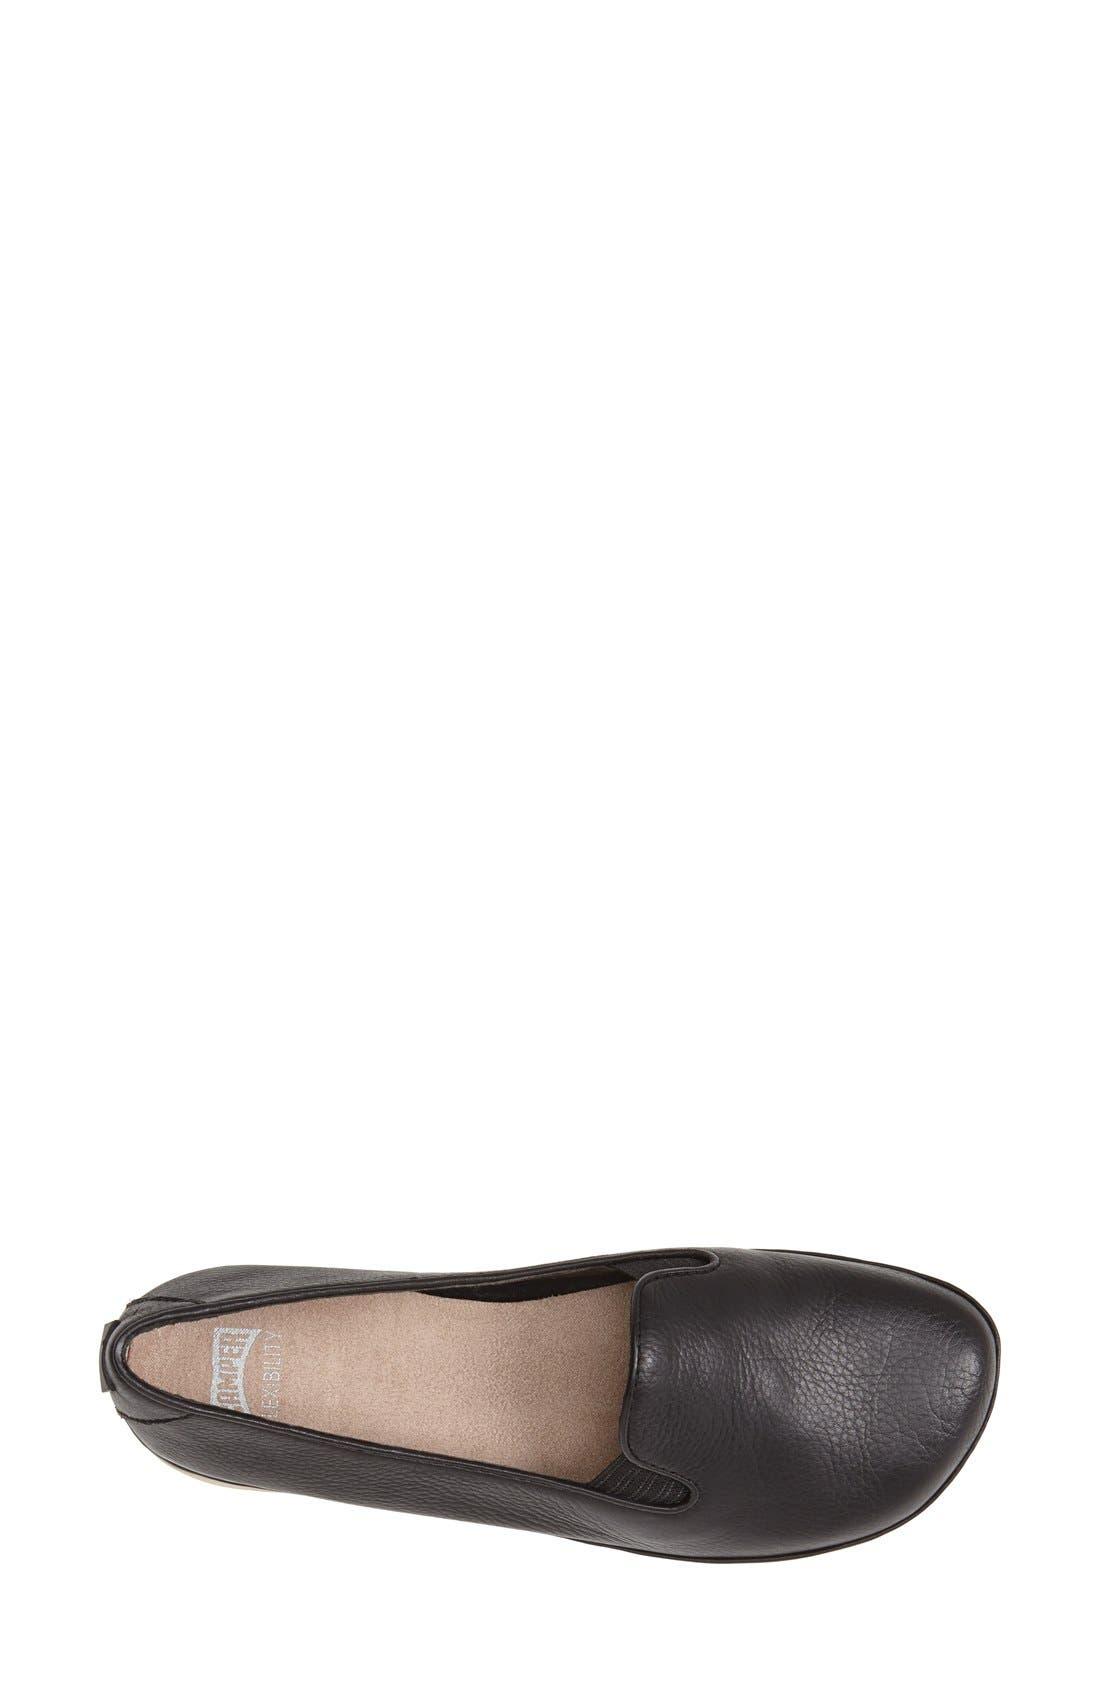 'Right Nina' Leather Flat,                             Alternate thumbnail 21, color,